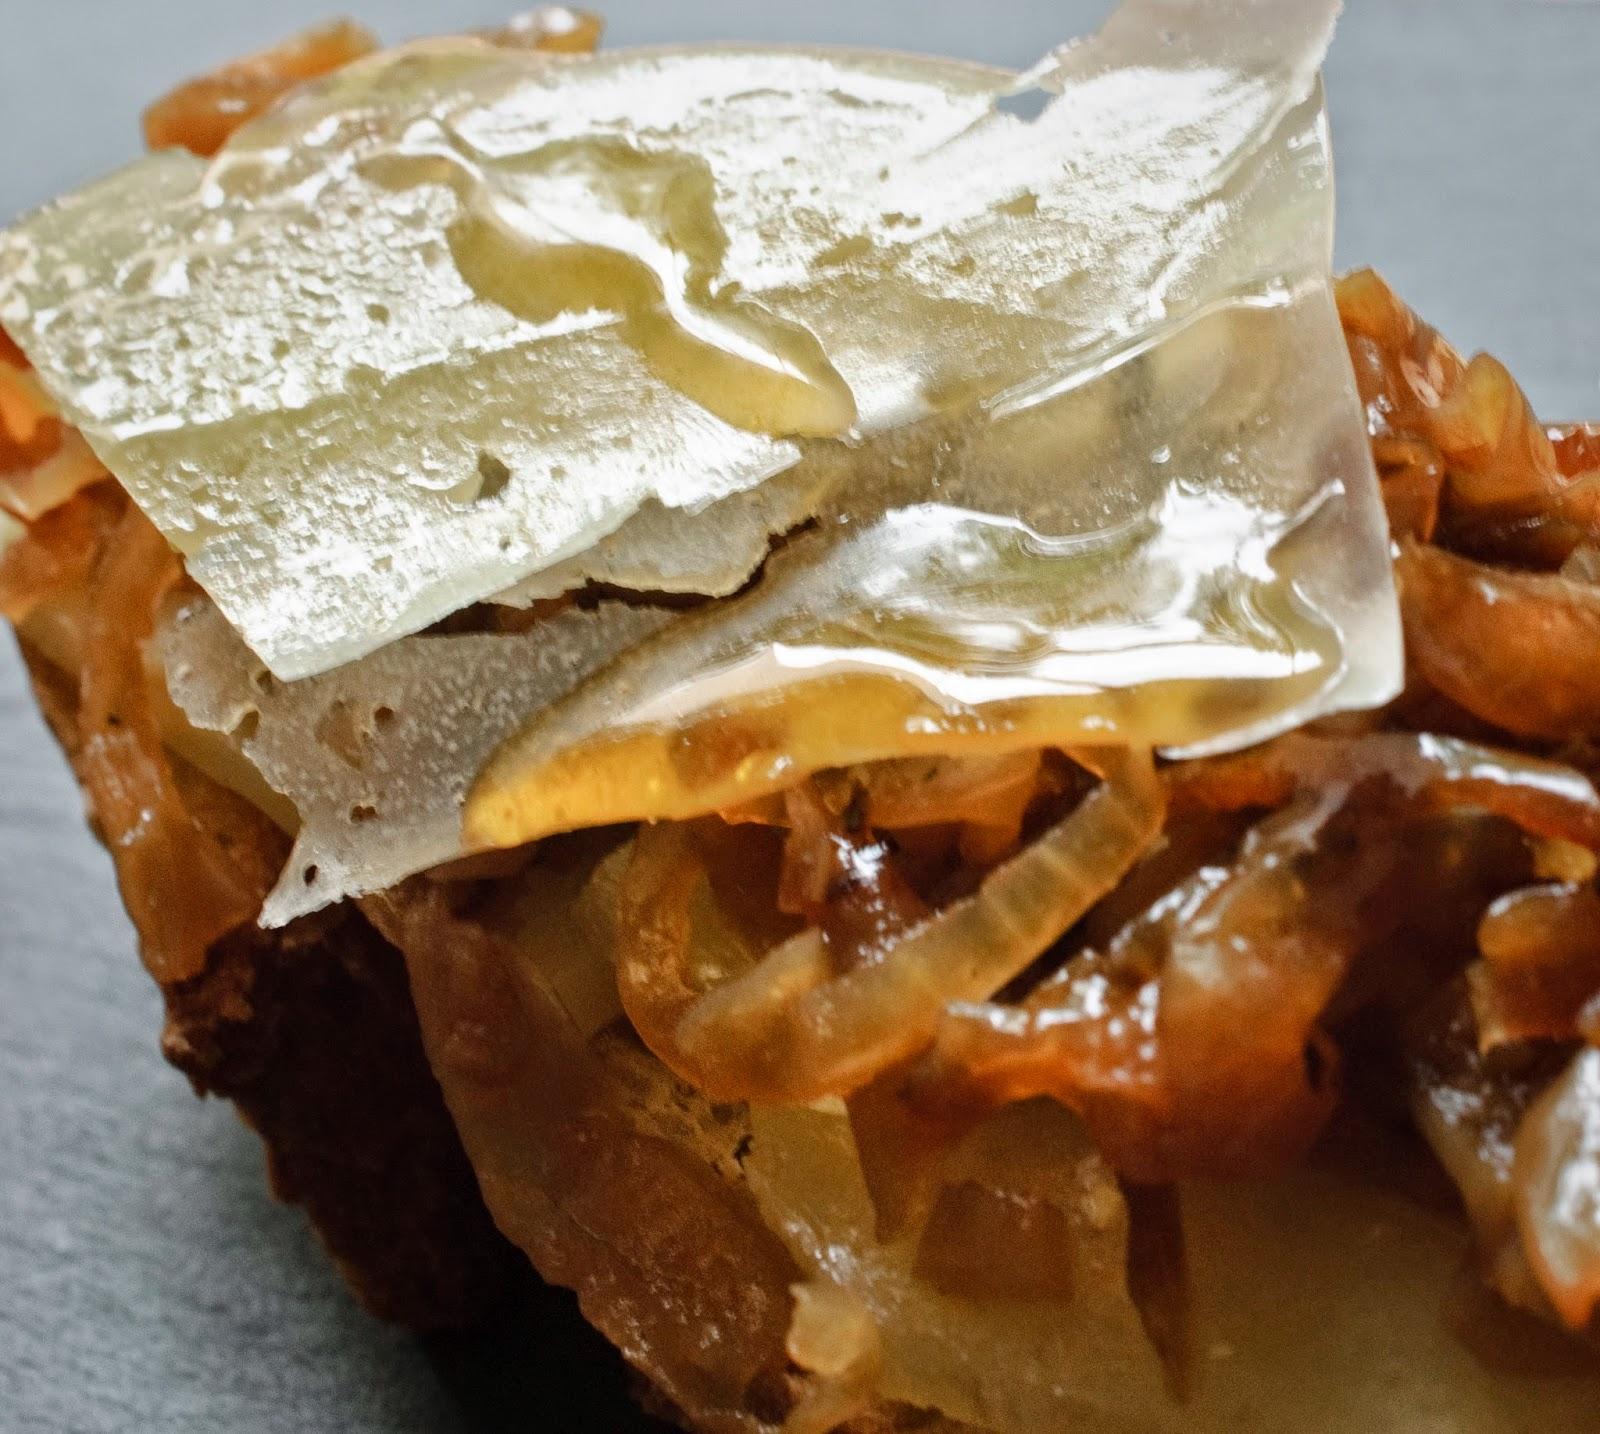 Tosta de cebolla pochada; poached onion toast